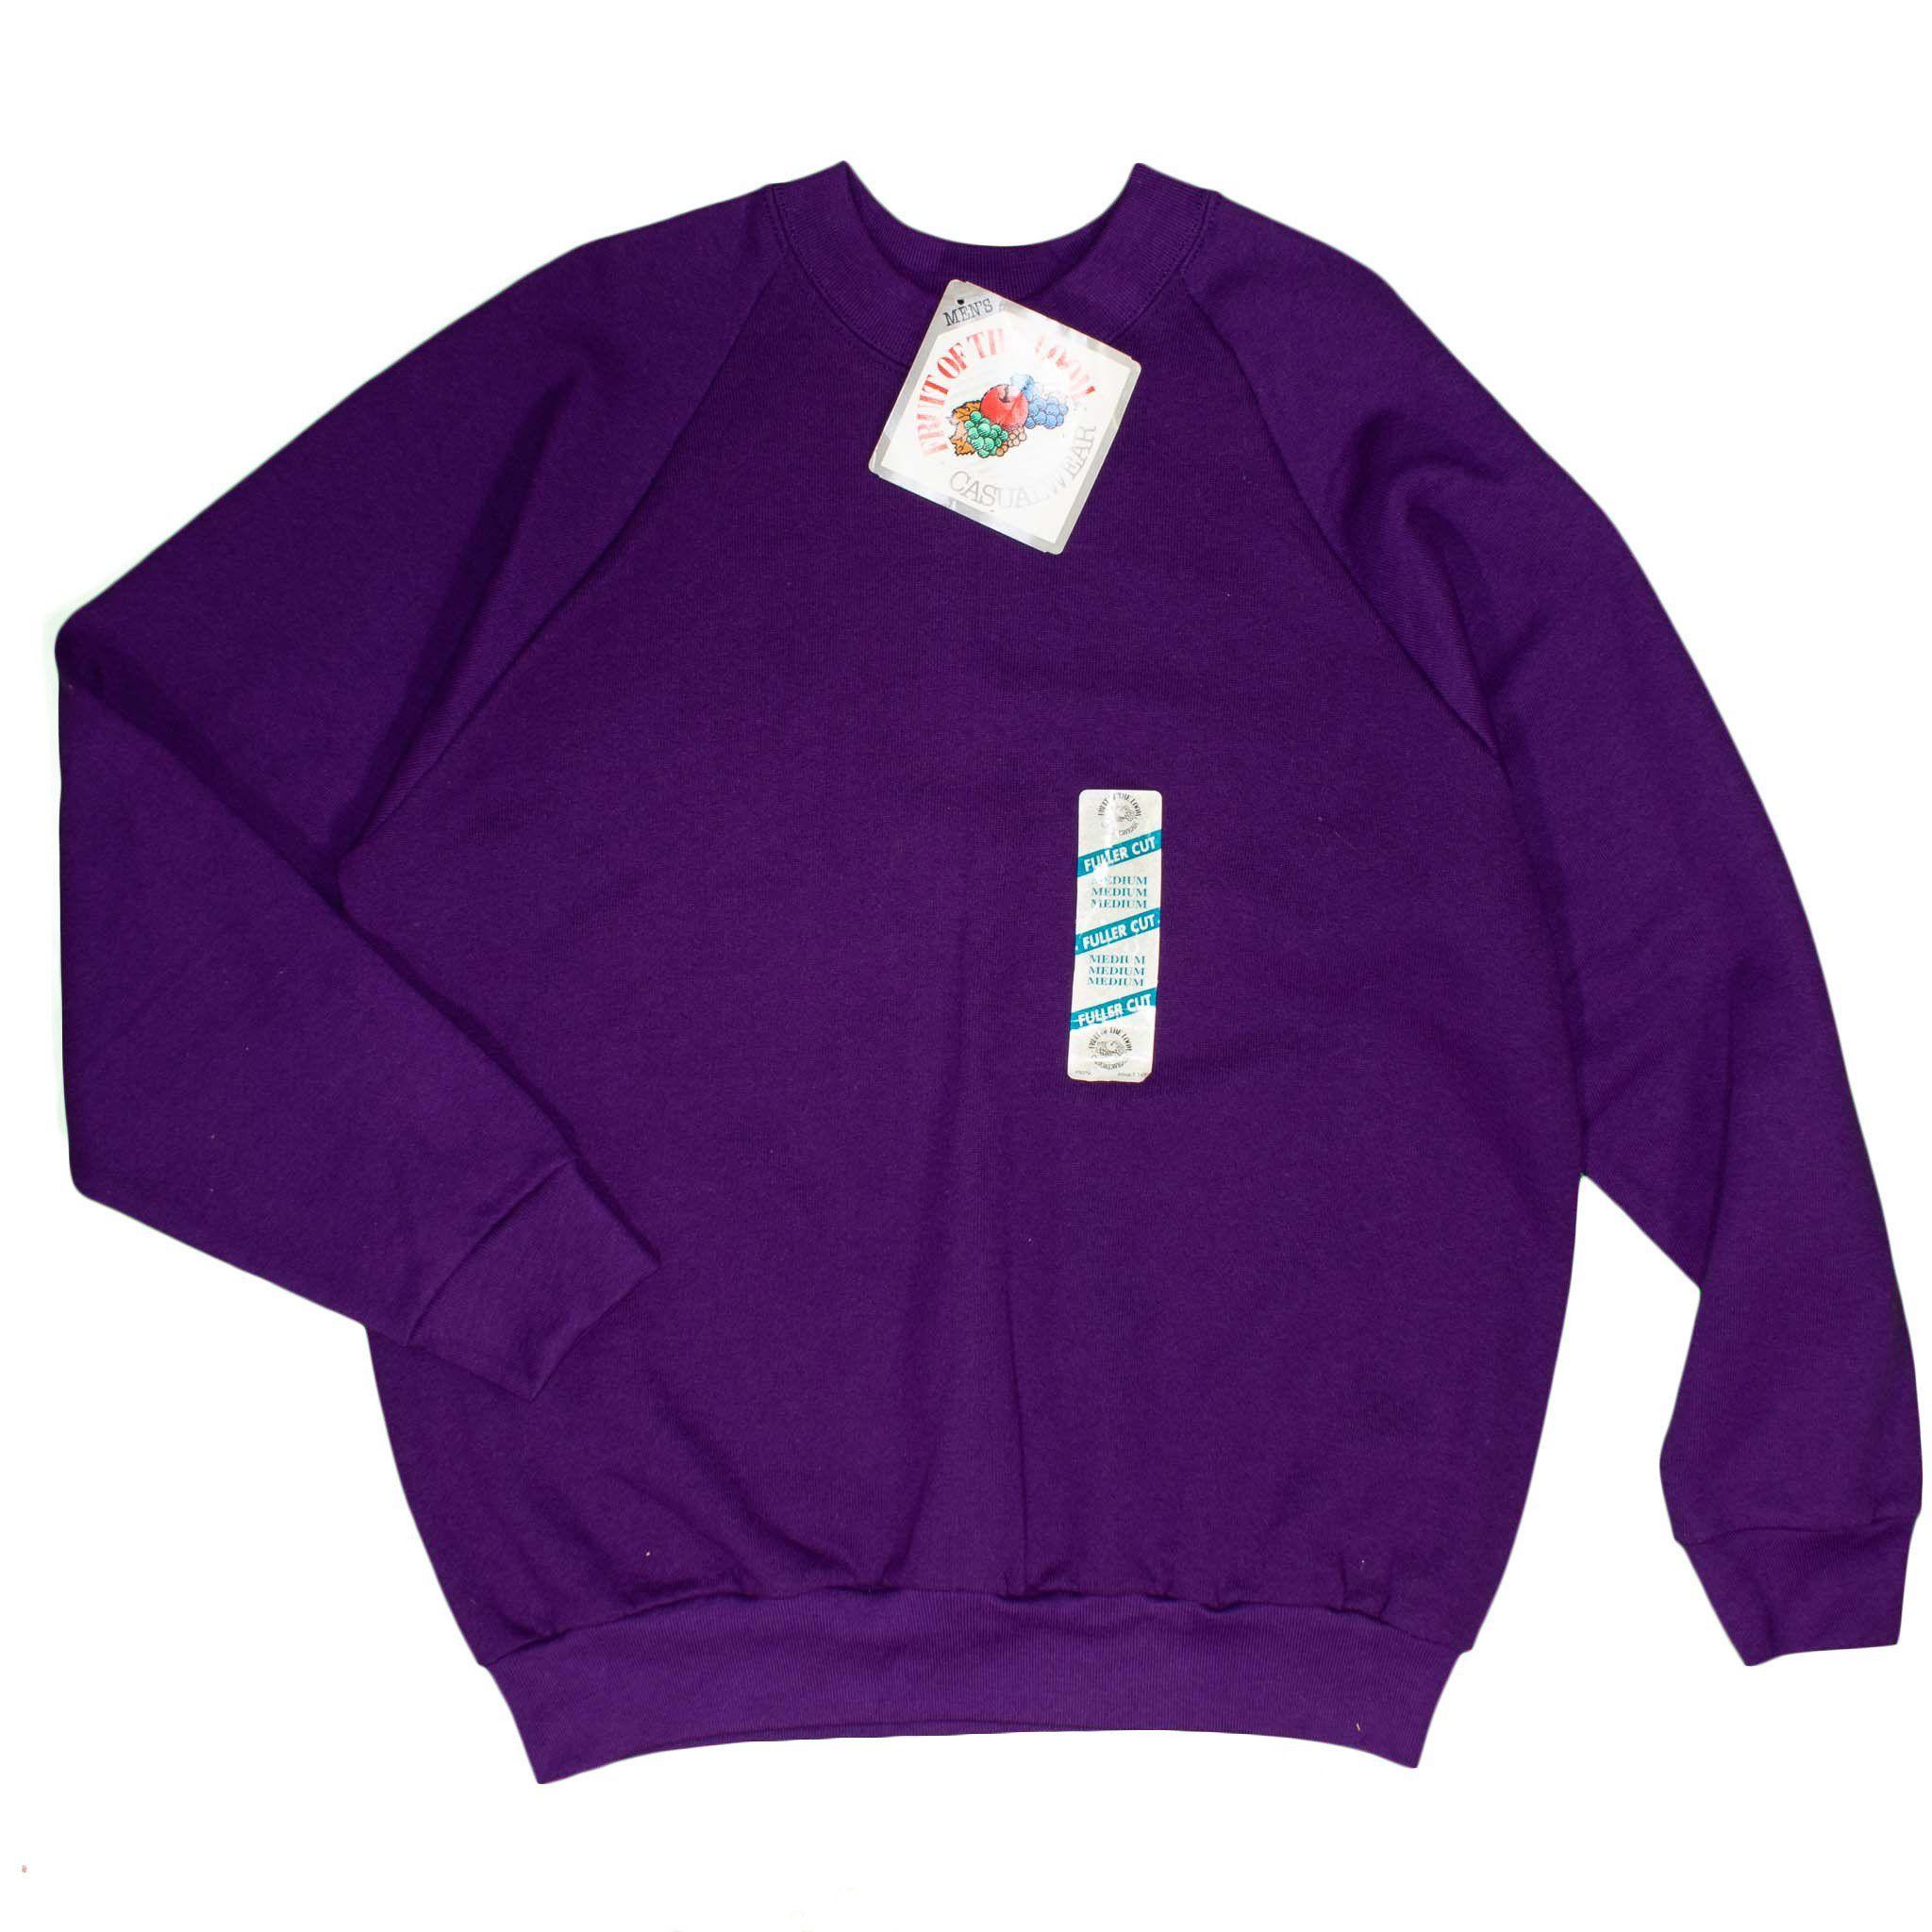 Fruit of the Loom Men's Sweatshirt 90's Vintage Purple